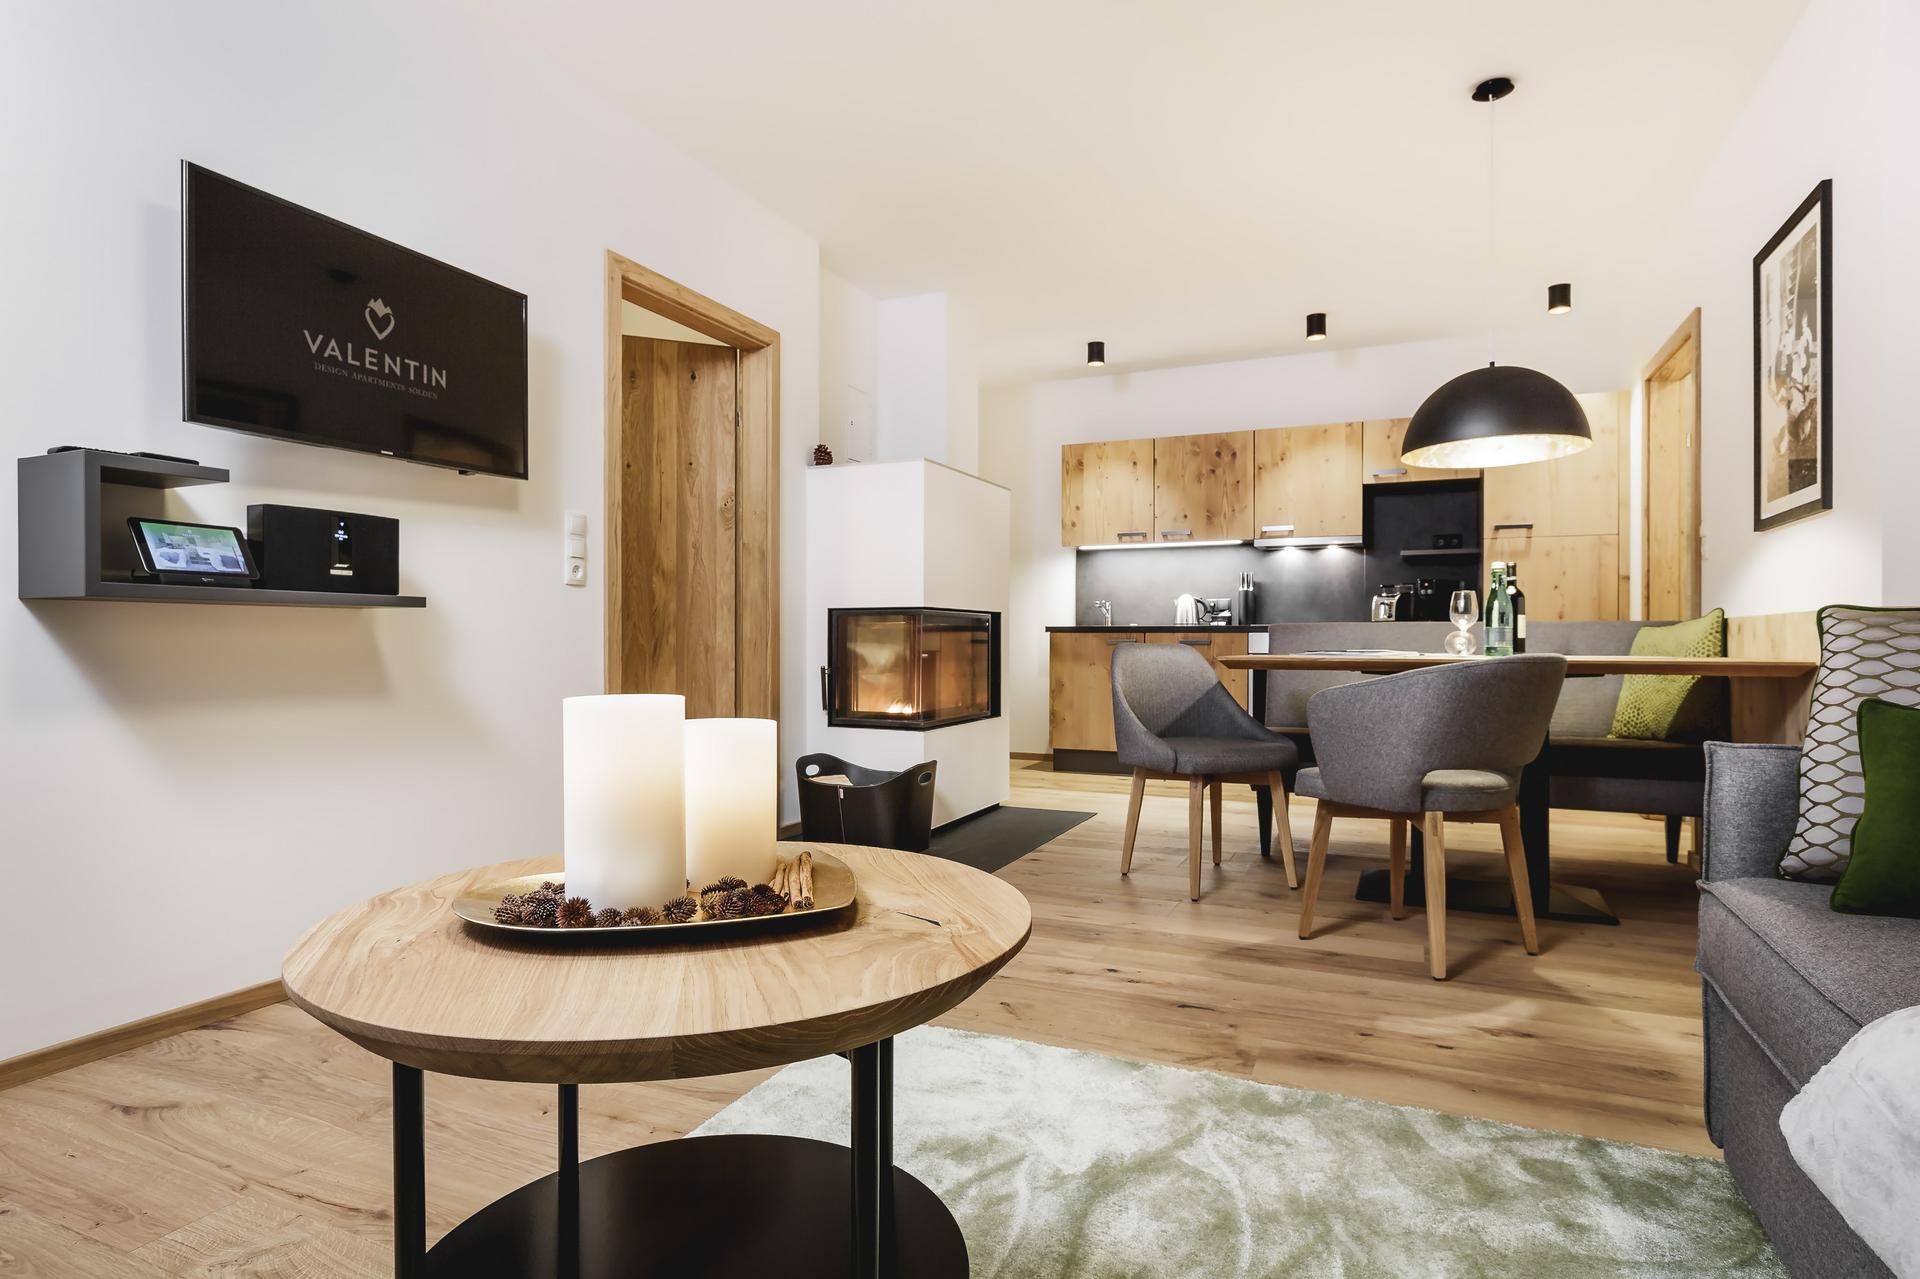 Design-Apartments Valentin in Sölden-Tirol